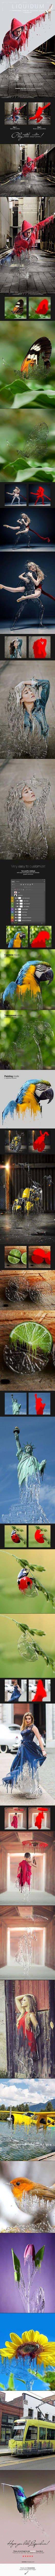 Liquidum - Transparent Painting Photoshop Action - Photo Effects Actions